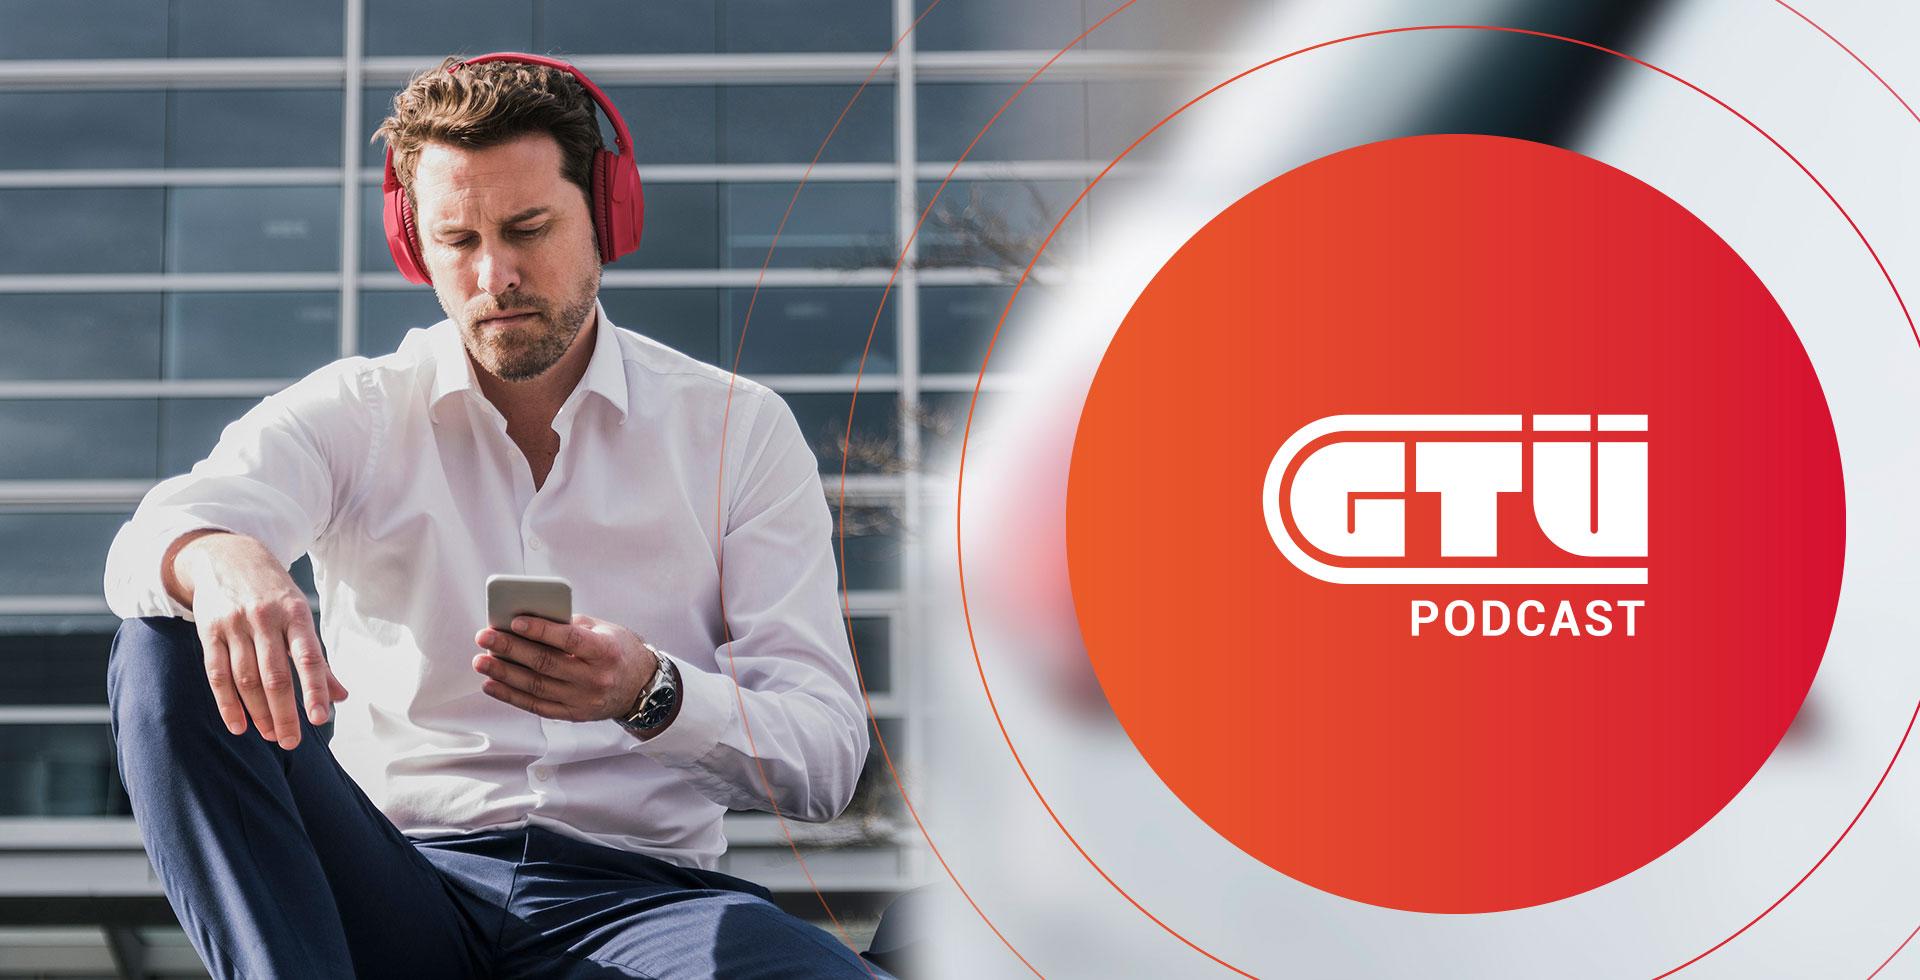 GTÜ Podcast